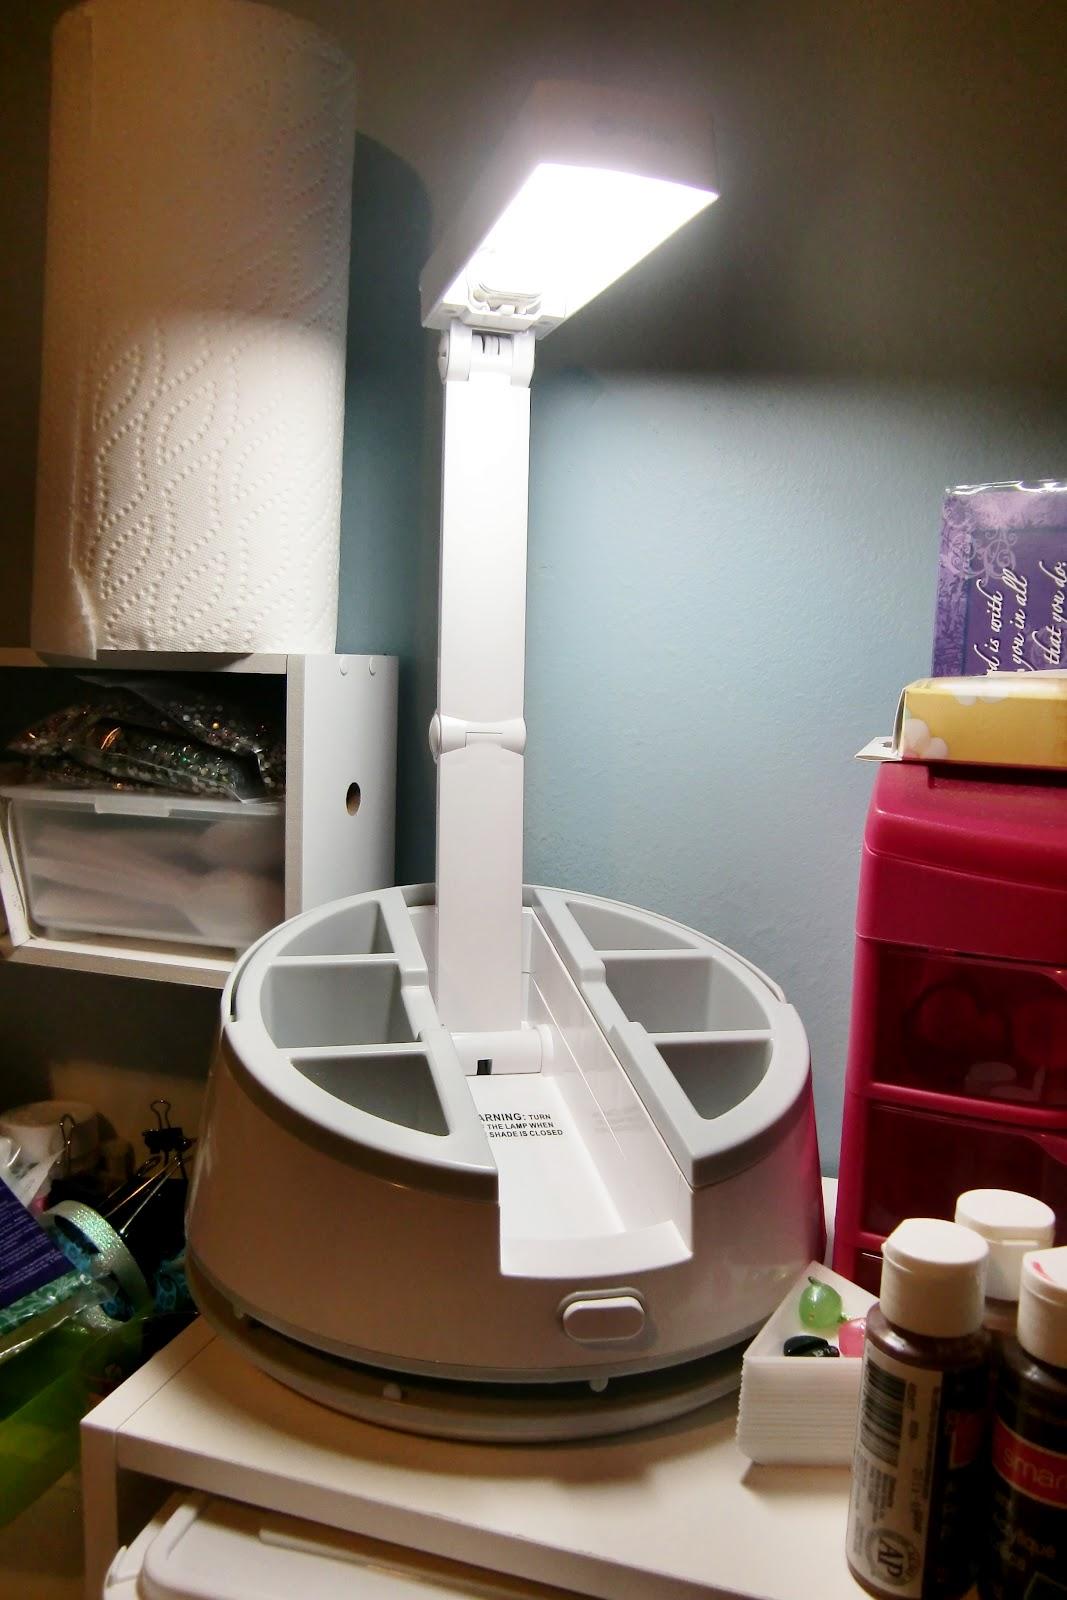 PinkPandaCraftShop: My lovely Craft Caddy Lamp from OttLite!